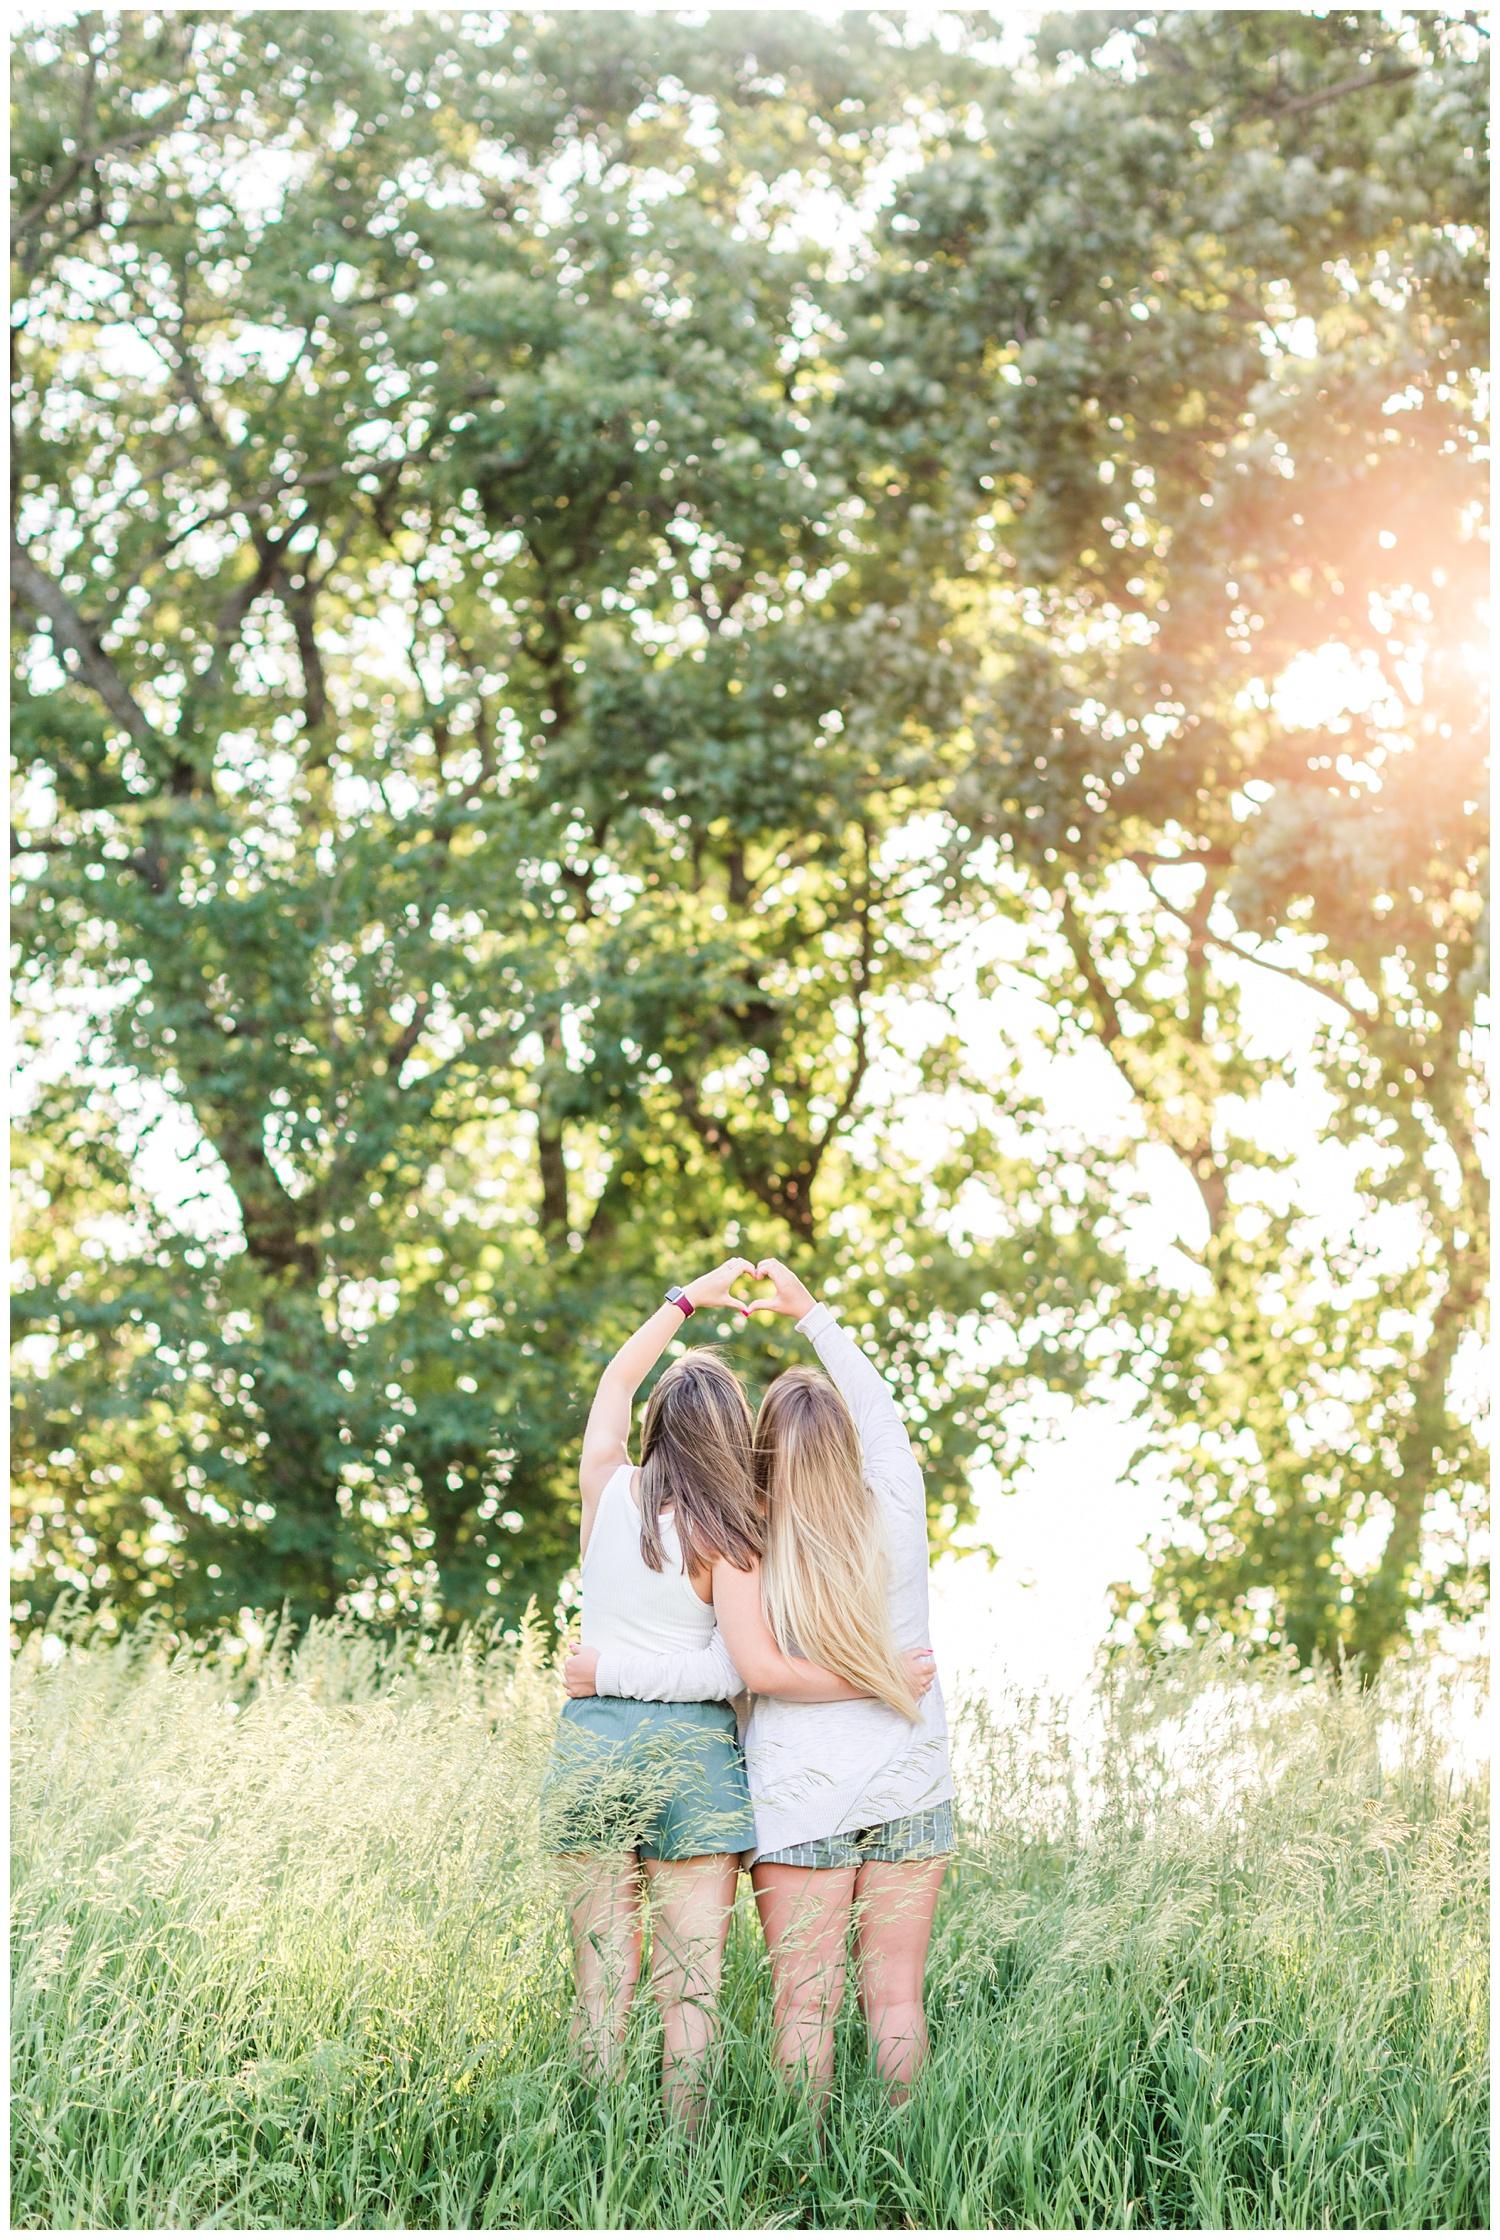 Senior girls best friends BFFs make a heart symbol with their hands in a grassy field on a rural Iowa farm | CB Studio